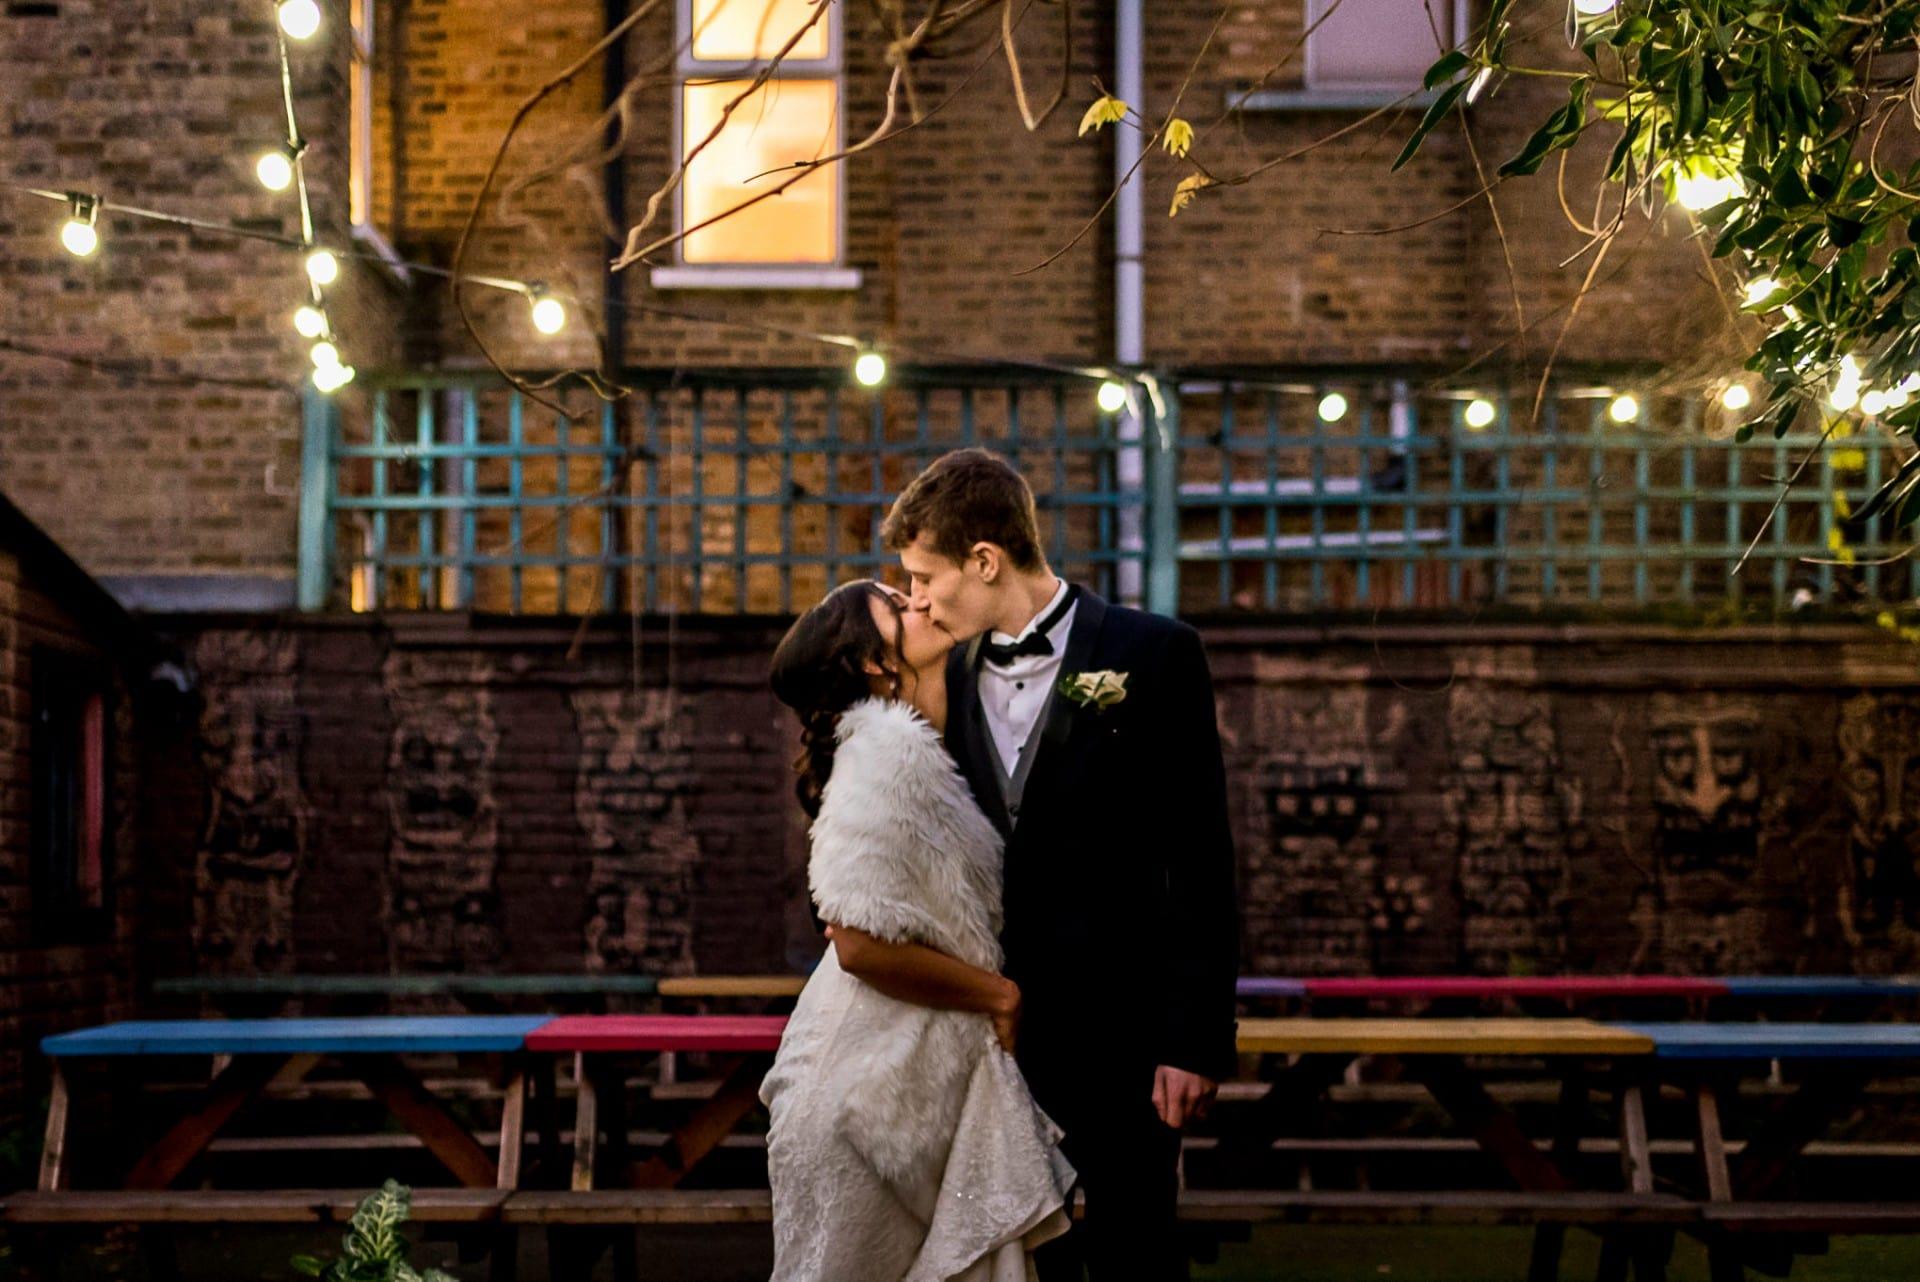 Wandsworth Town Hall, Carine Bea – London Wedding Photographer – Wedding at Wandsworth Town Hall